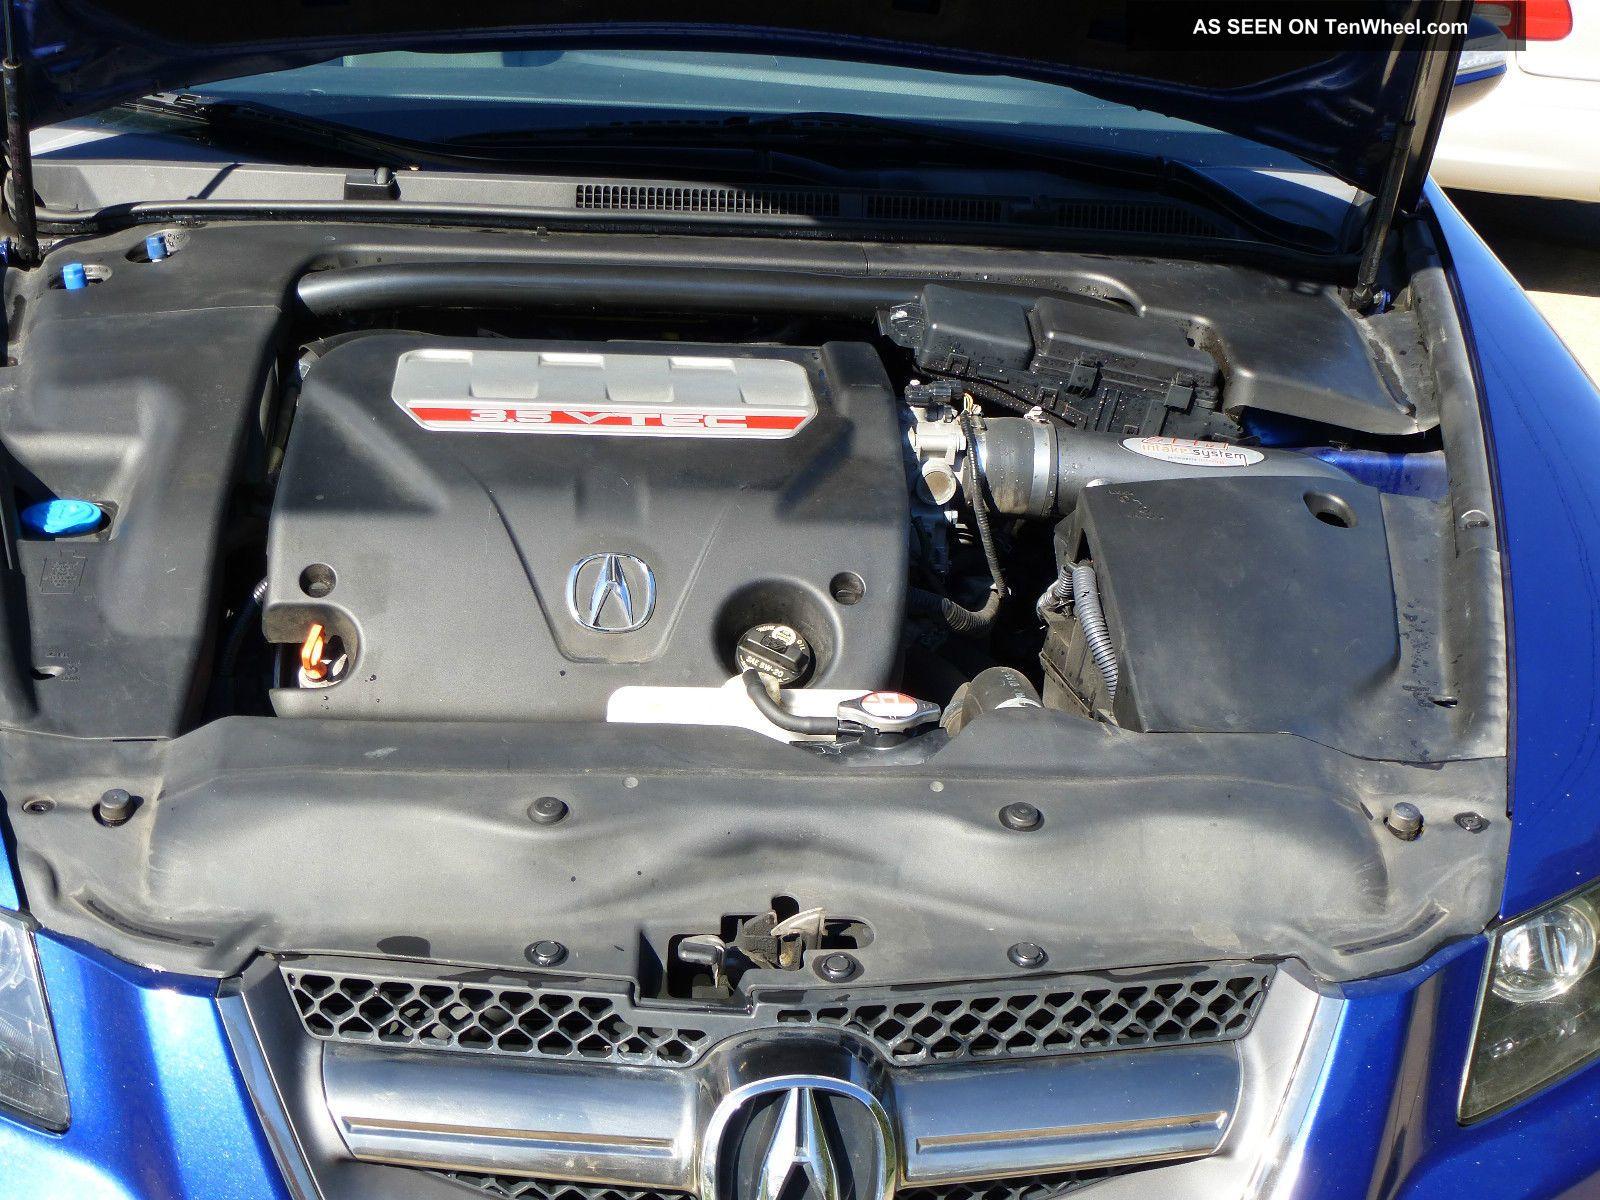 2007 Acura Tl Type S 4 Door 3 5l V6 6spd Manual